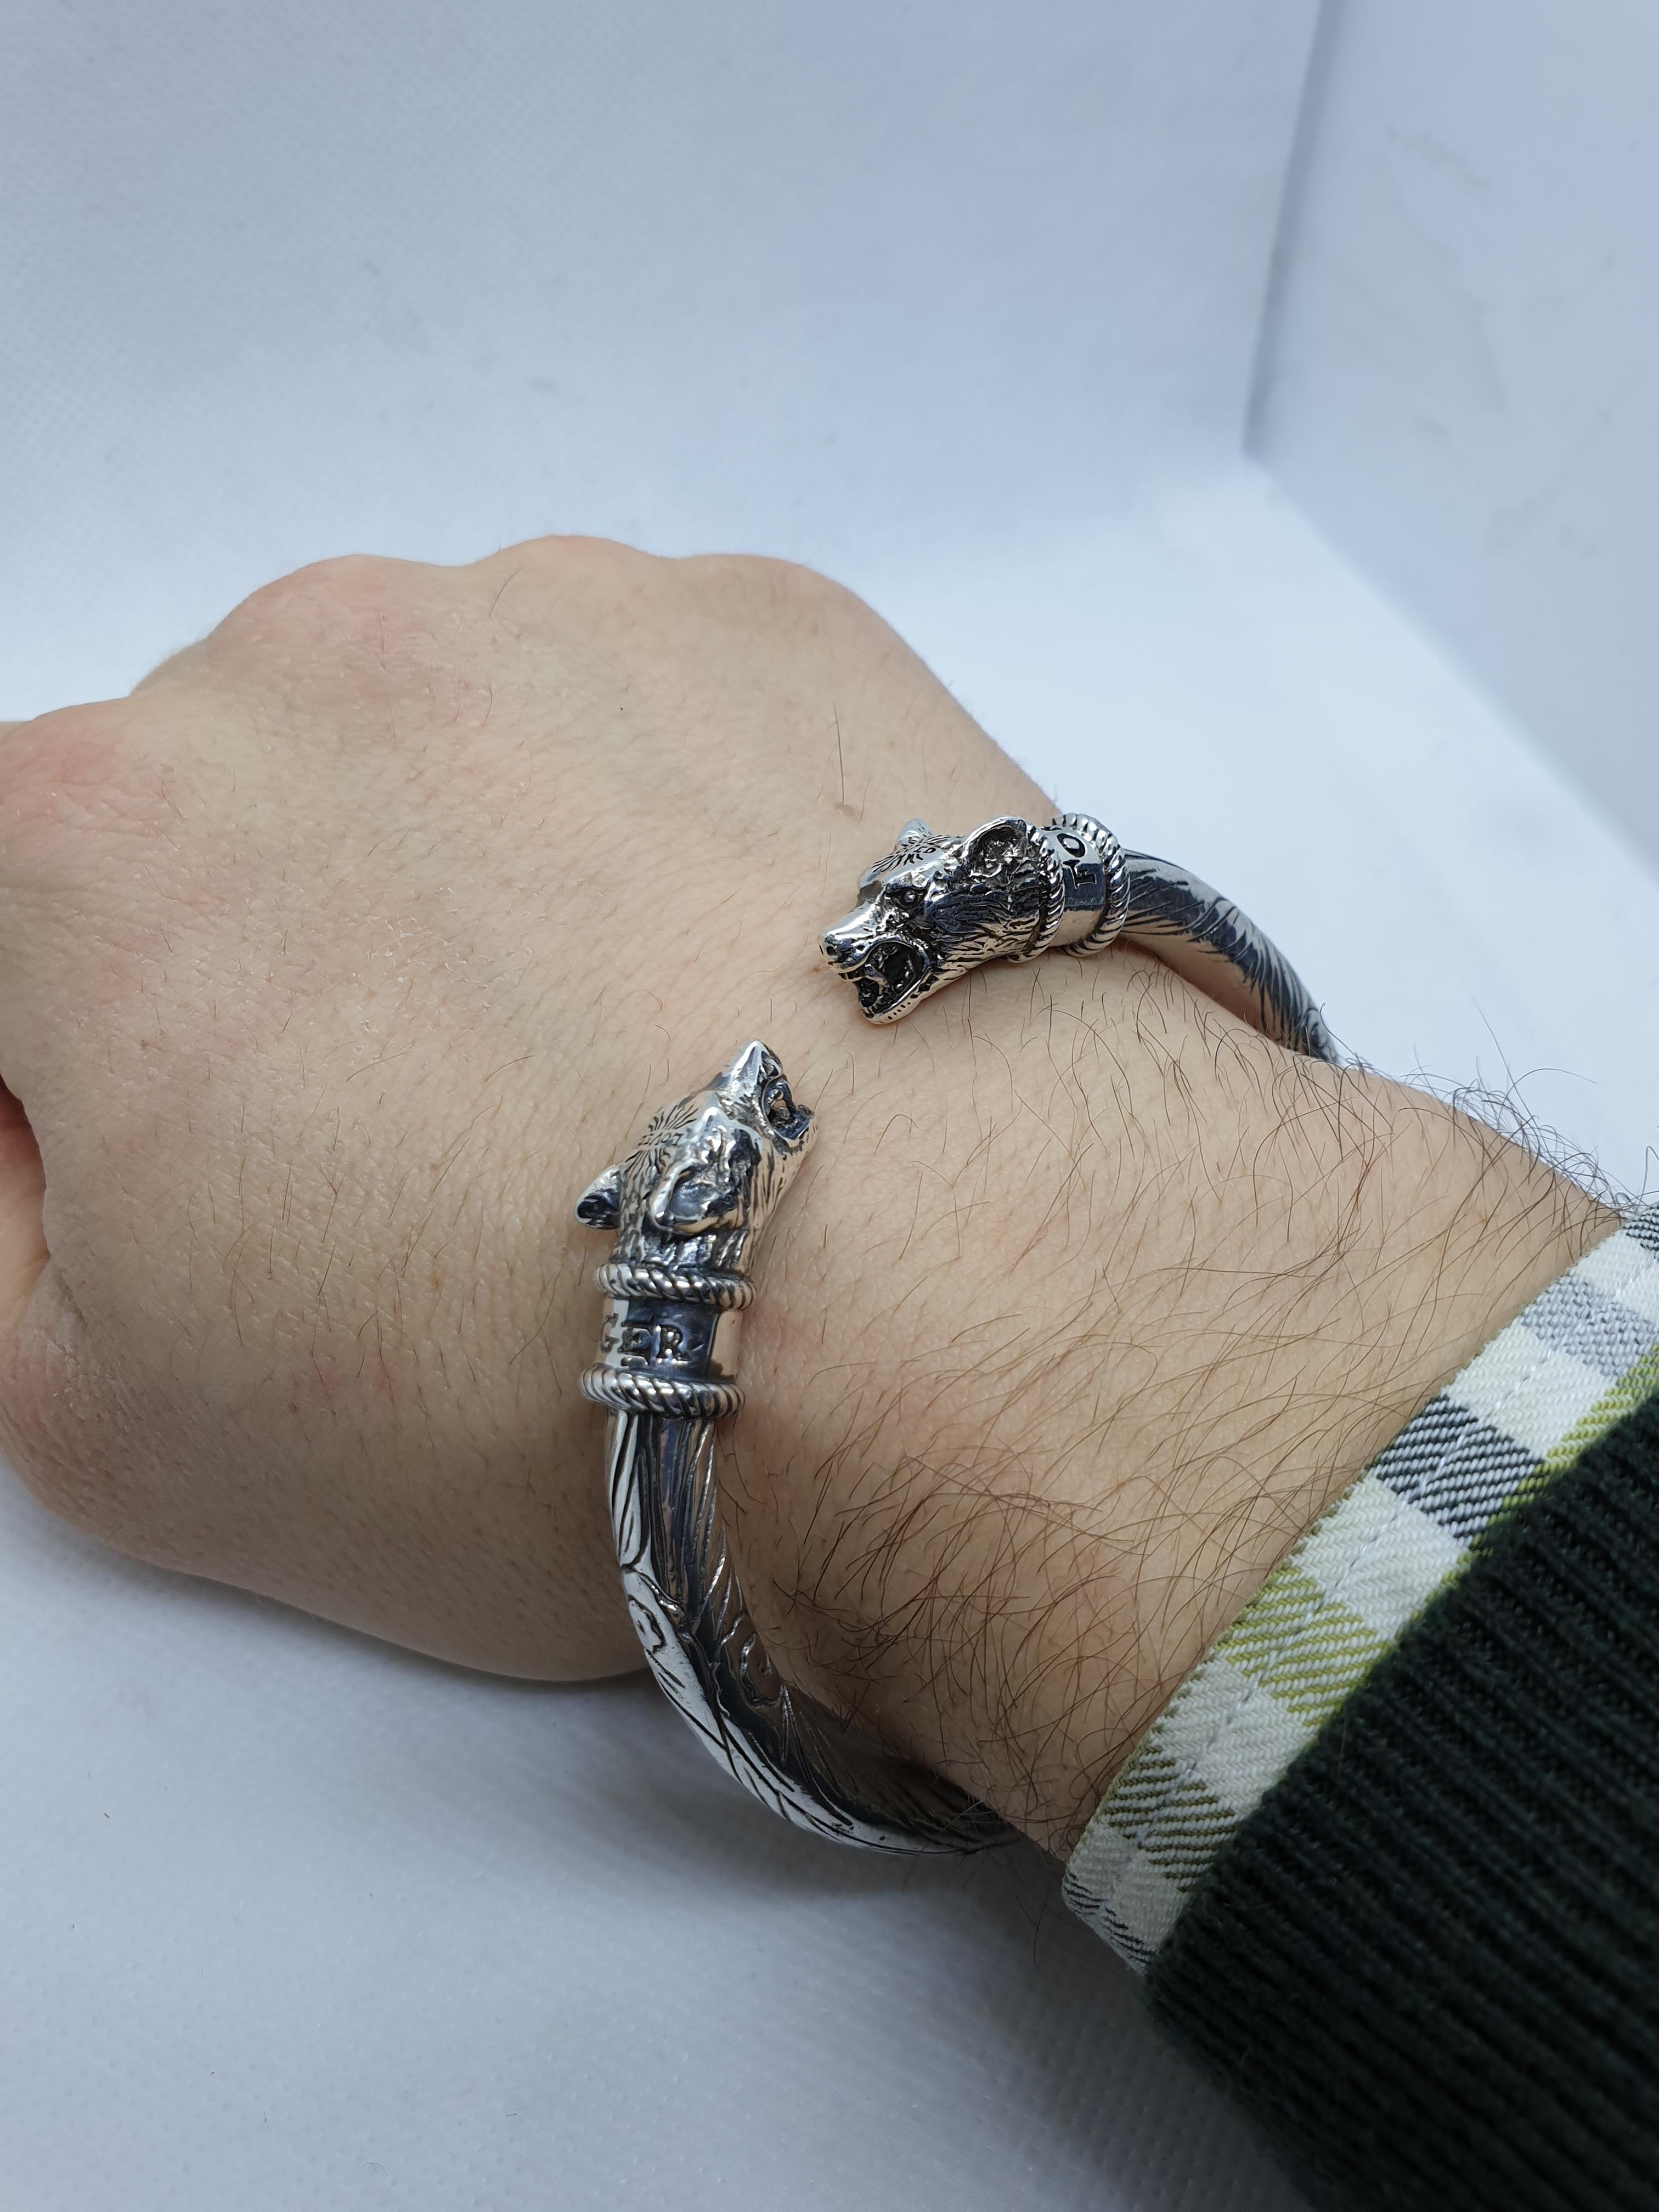 2d13175c7 Gucci Anger Forest Sterling Silver Man Bracelet, 2010s For Sale at 1stdibs